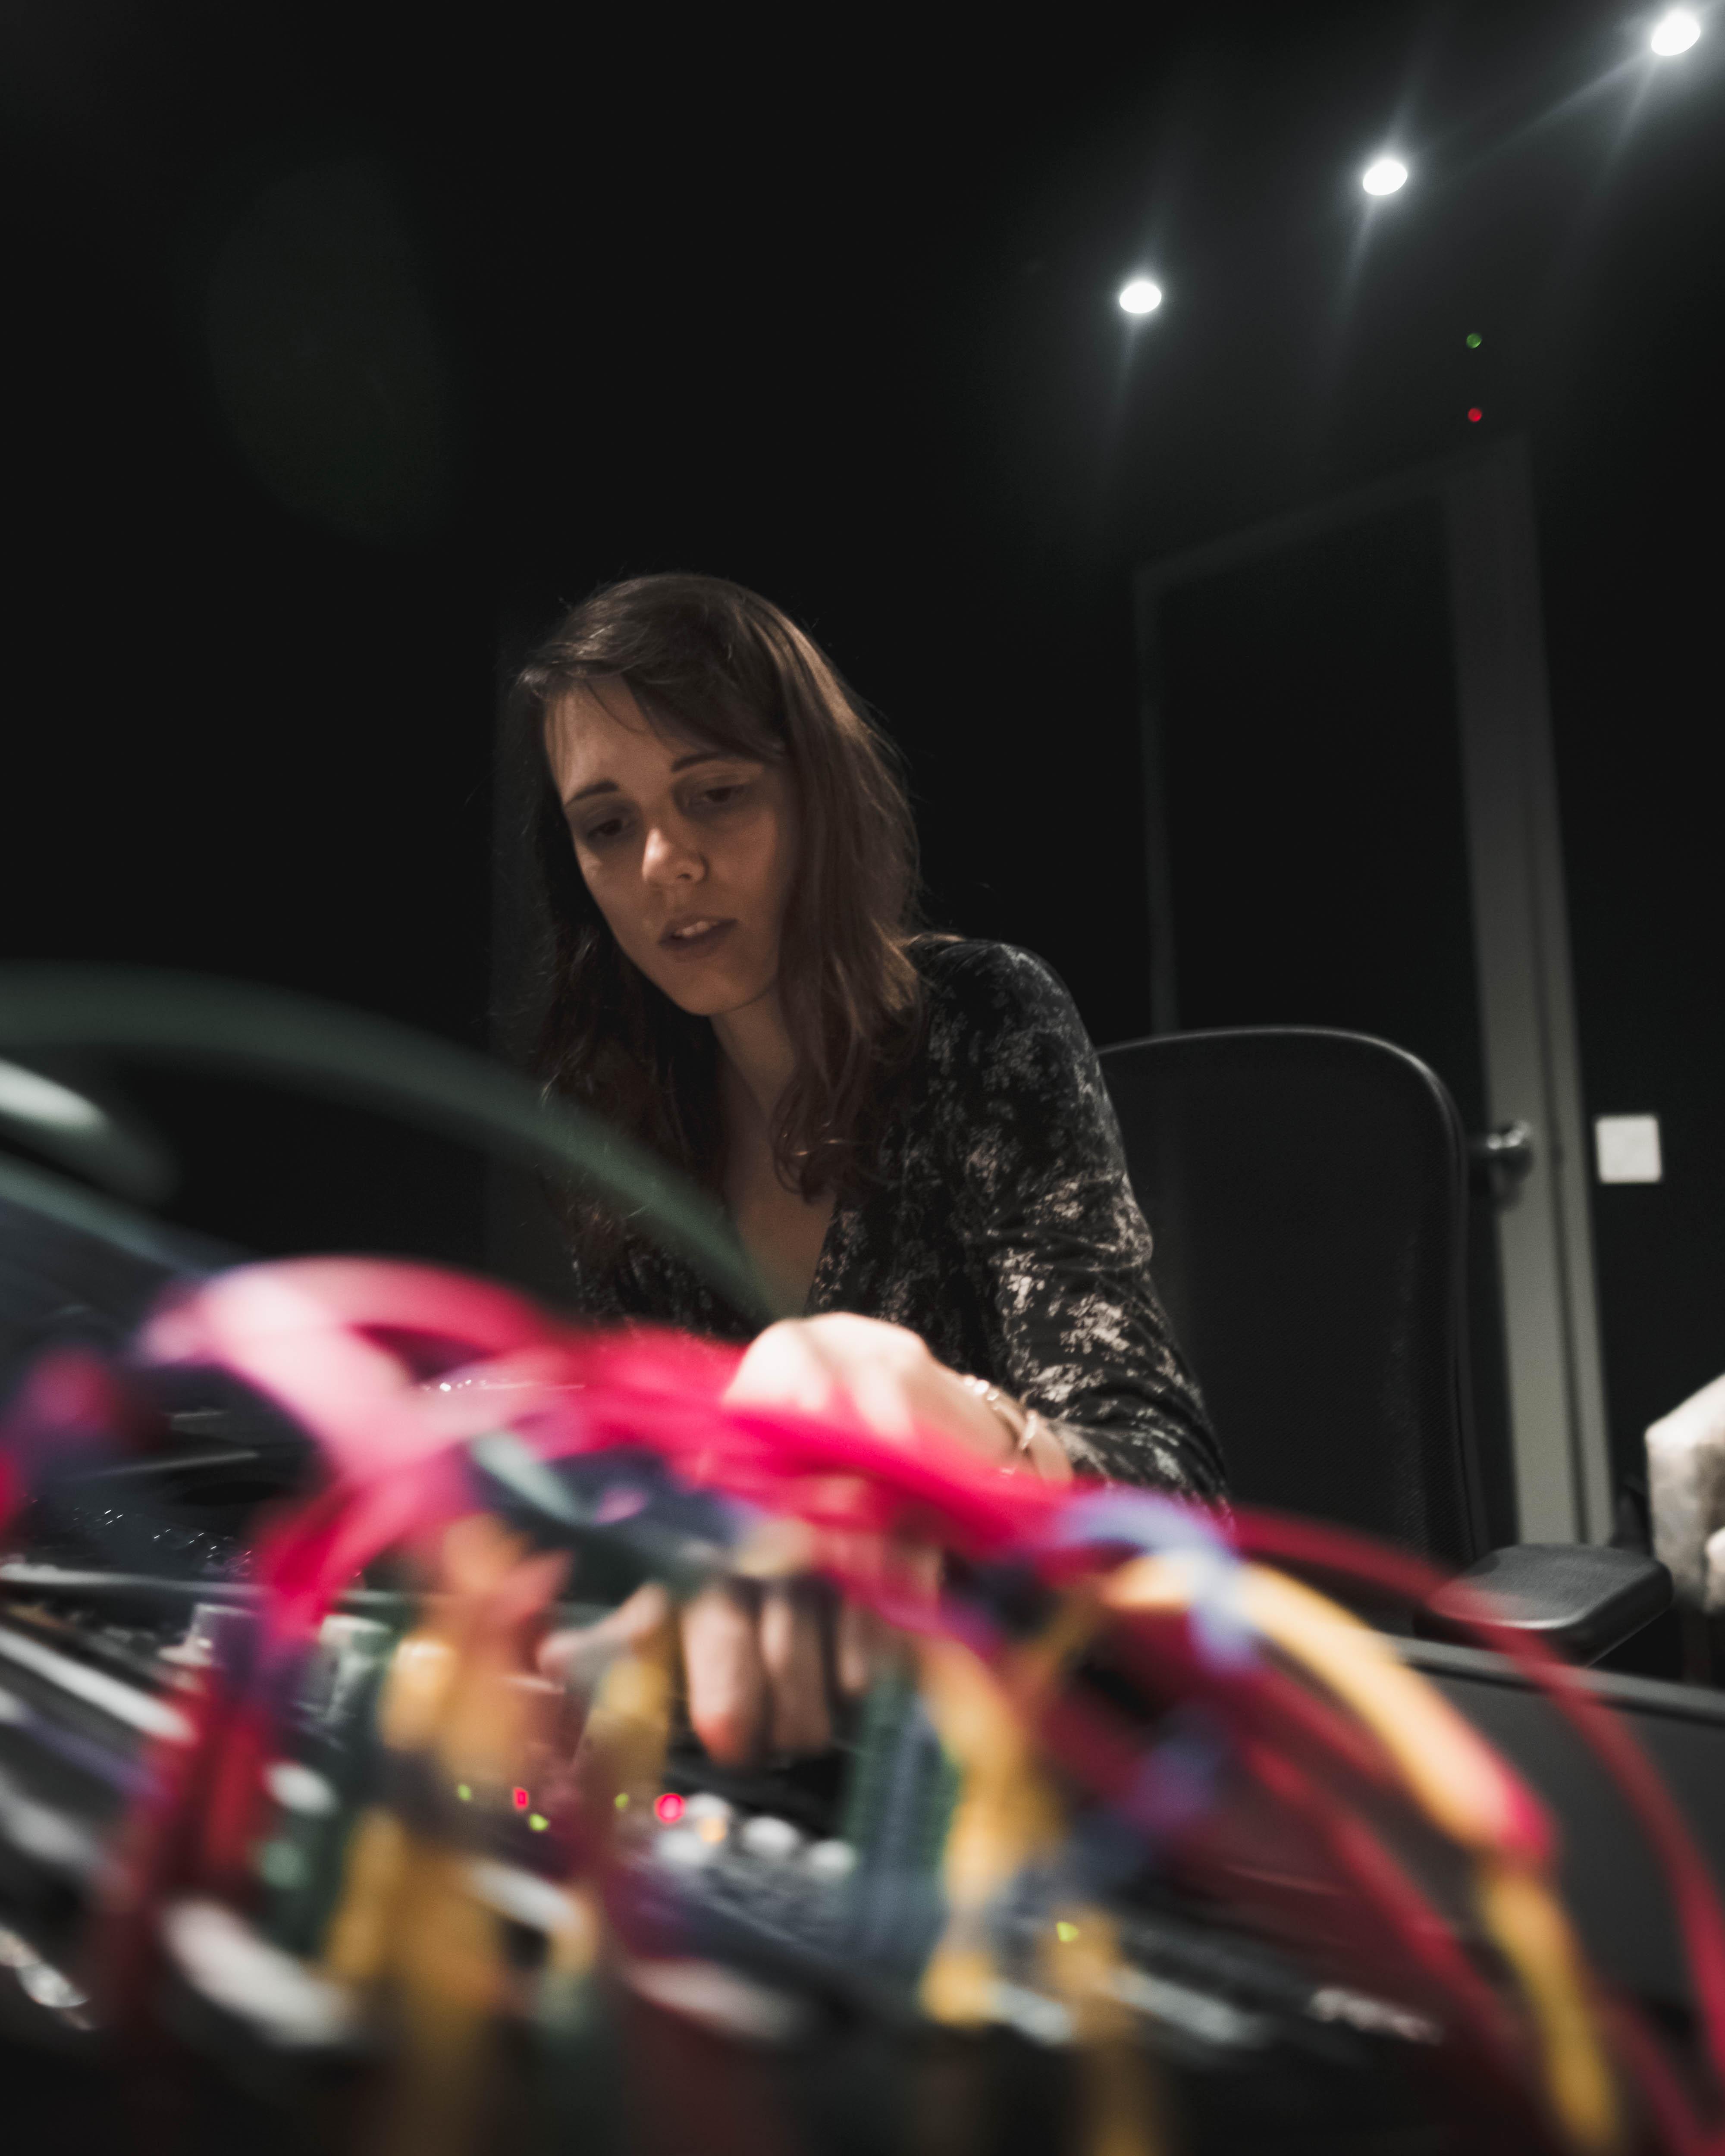 Artscape Daniels Launchpad Sound Recording Studio Technician Marian Hutten